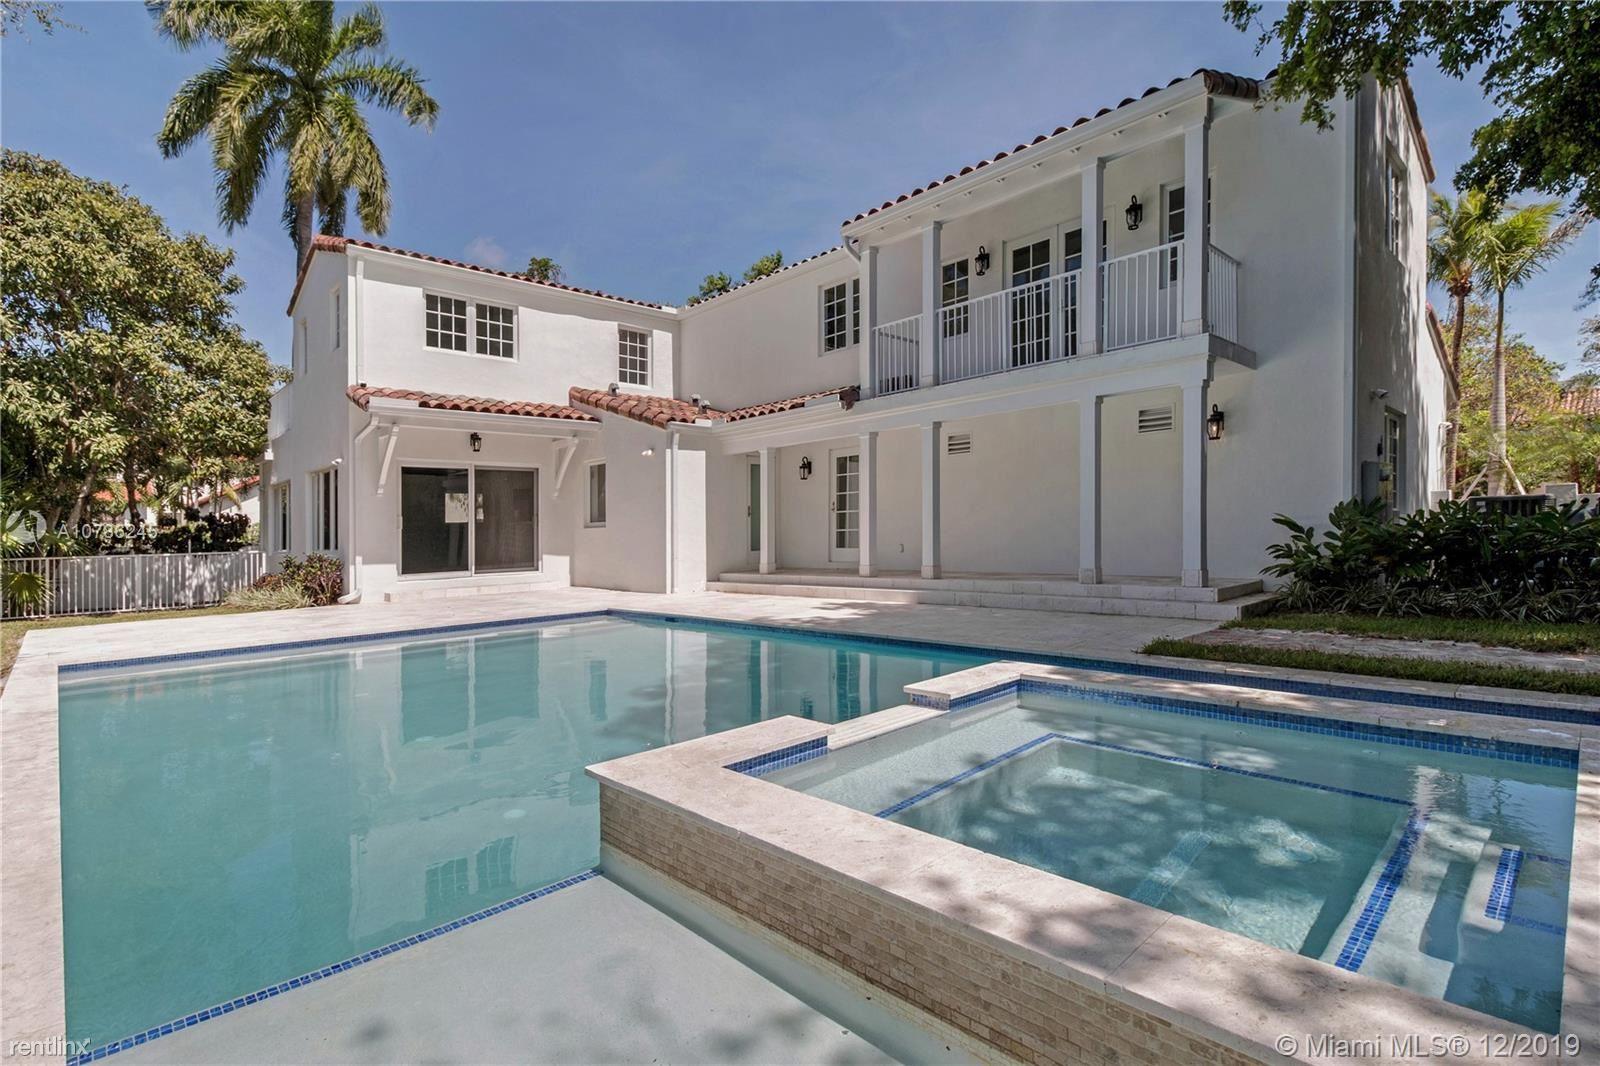 533 Alhambra Cir, Coral Gables, FL - $10,950